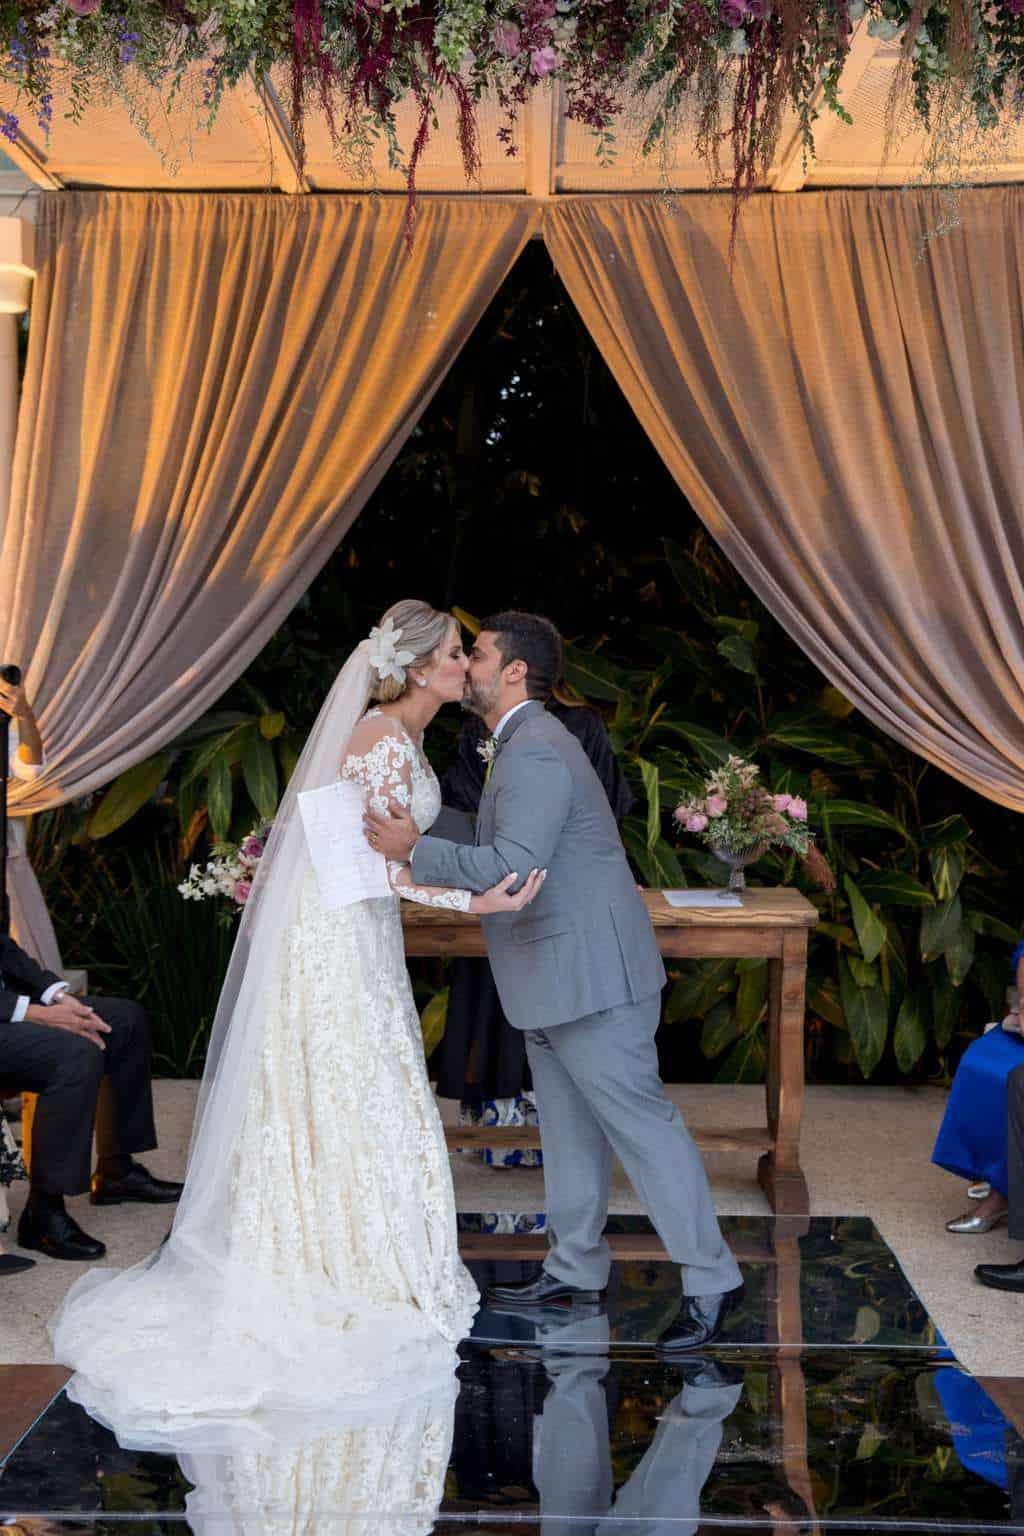 Andrea-Kapps-casamento-de-dia-casamento-na-serra-casamento-romântico-casamento-tradicional-cerimônia-Locanda-de-La-Mimosa-rosa-e-lilás-casamento-29